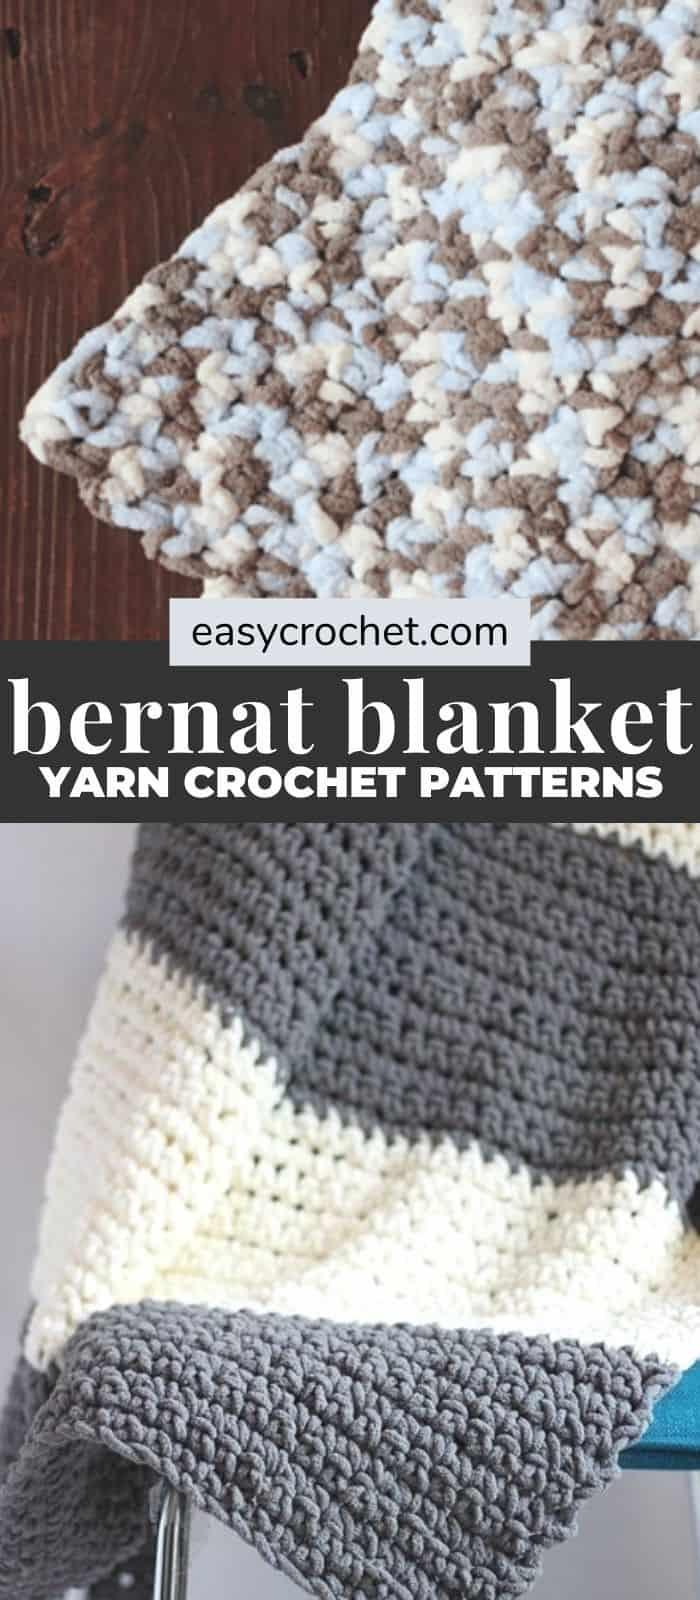 Bernat BLanket Yarn Crochet Blanket Patterns via @easycrochetcom